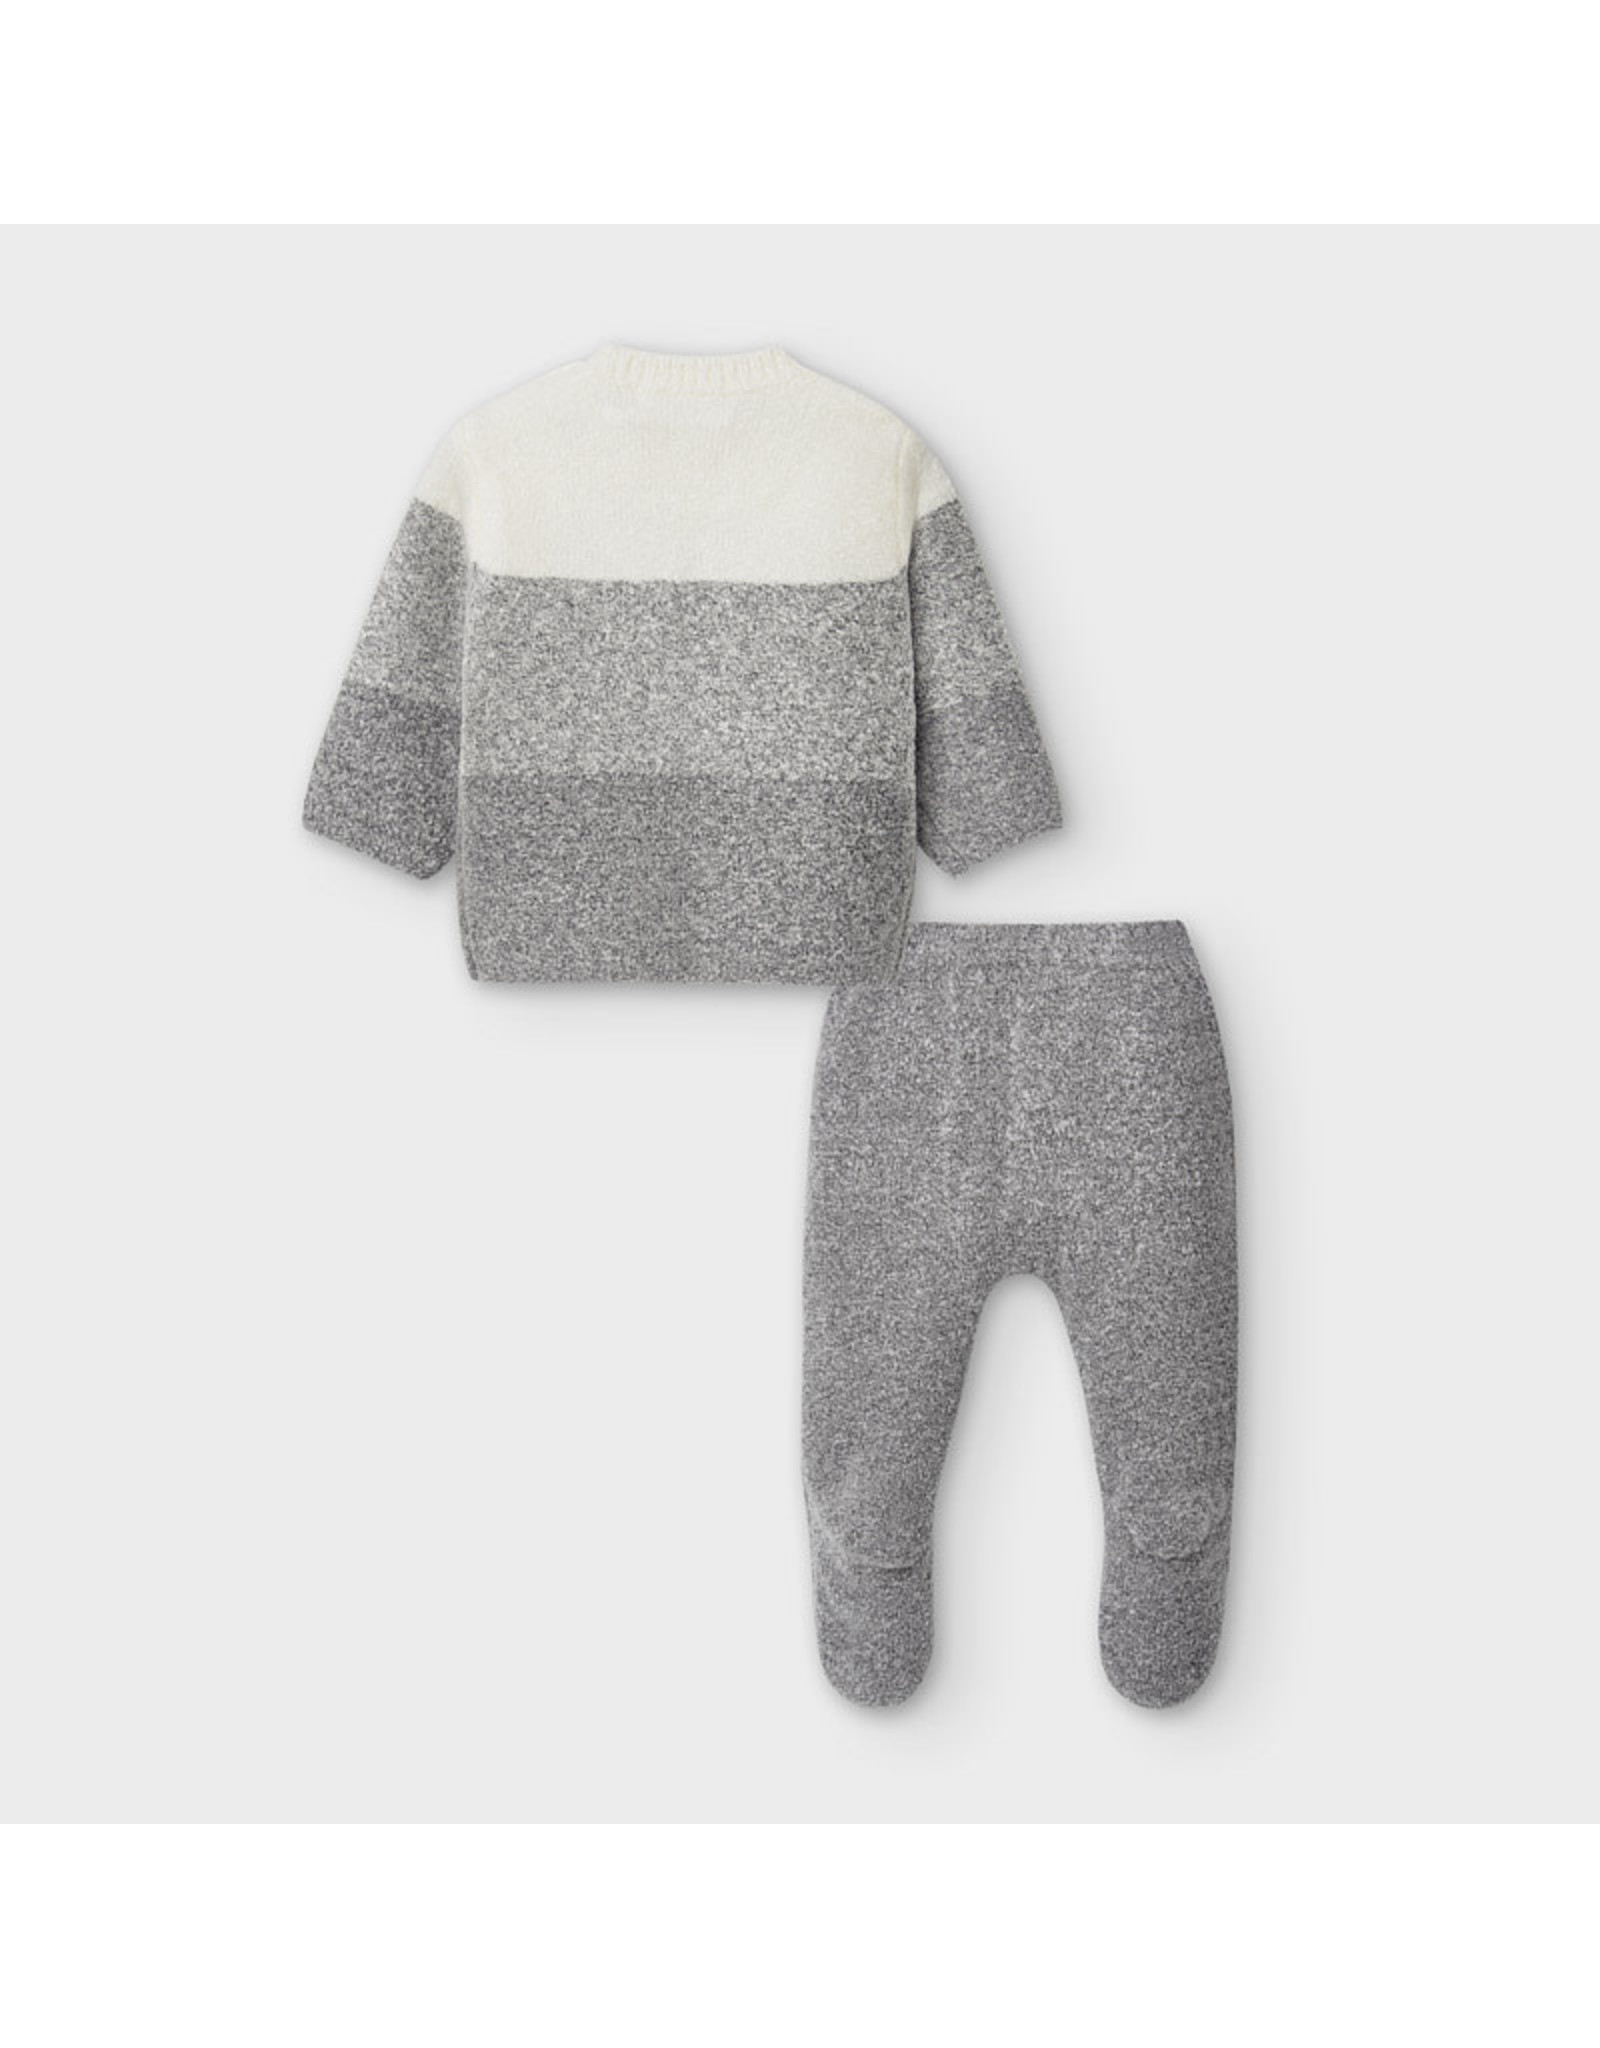 Mayoral Knit Pant/Sweater/Hat Set